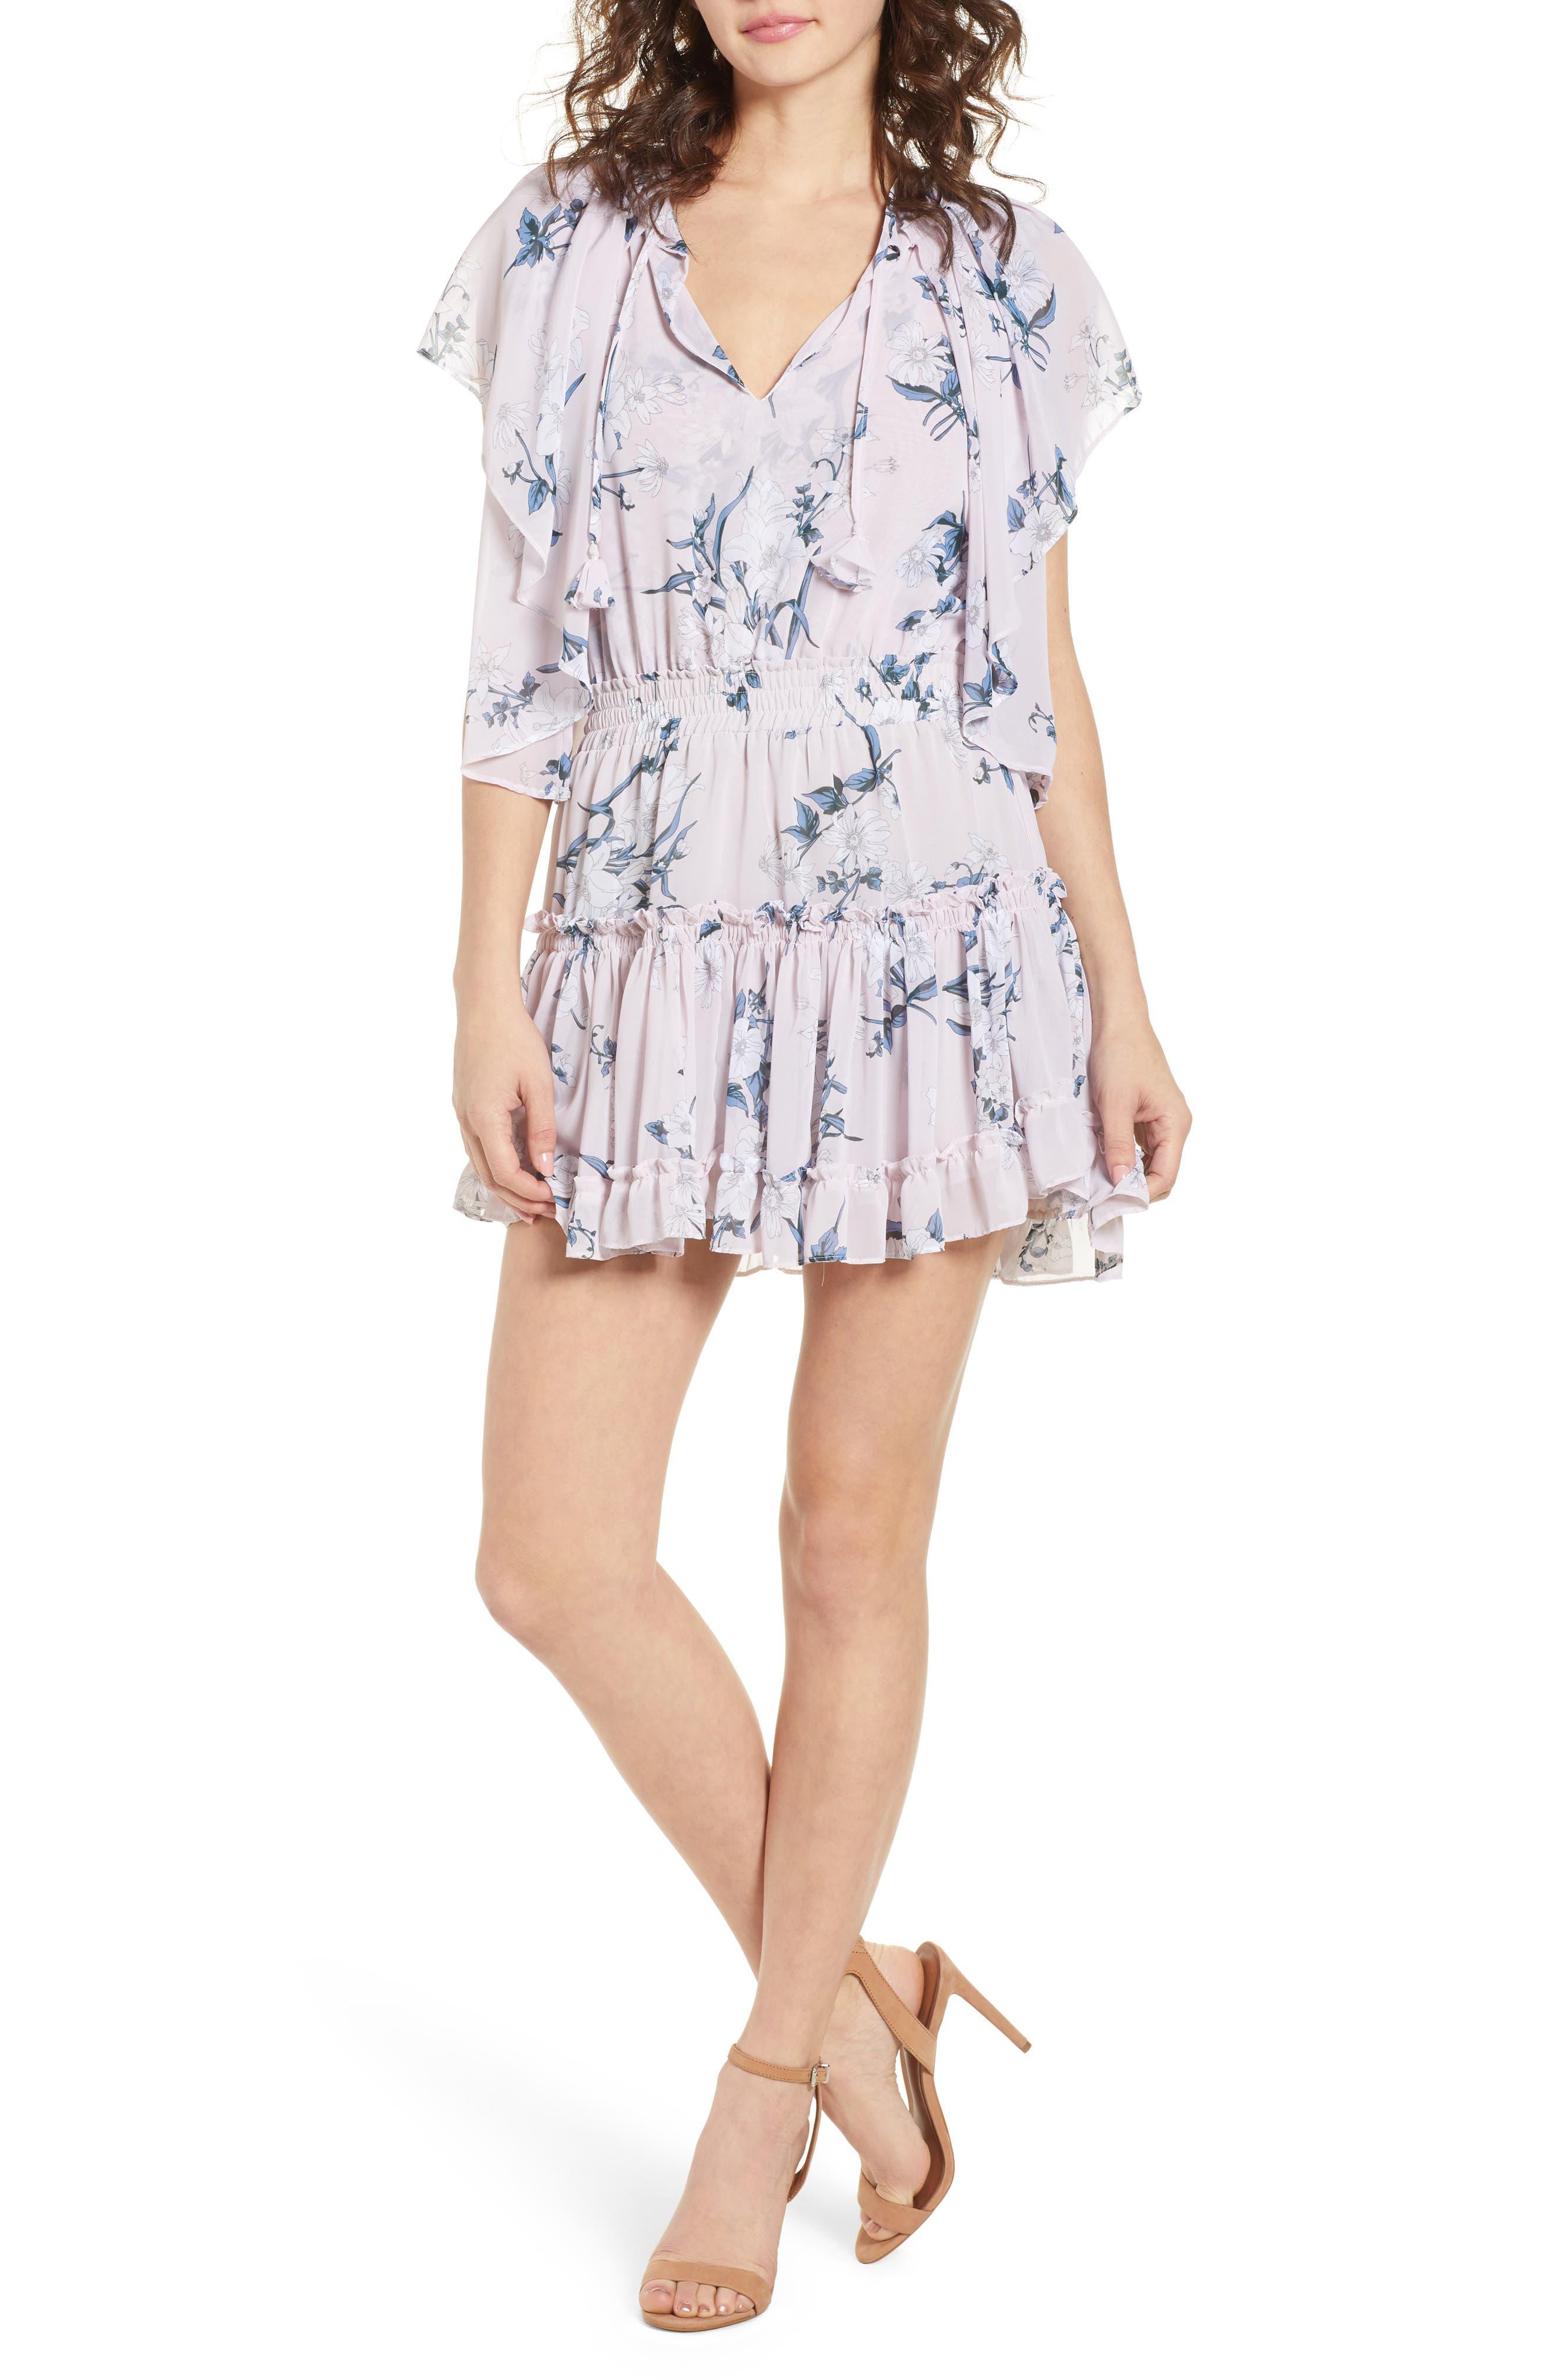 Lullu Dress,                             Main thumbnail 1, color,                             Multi Fe15